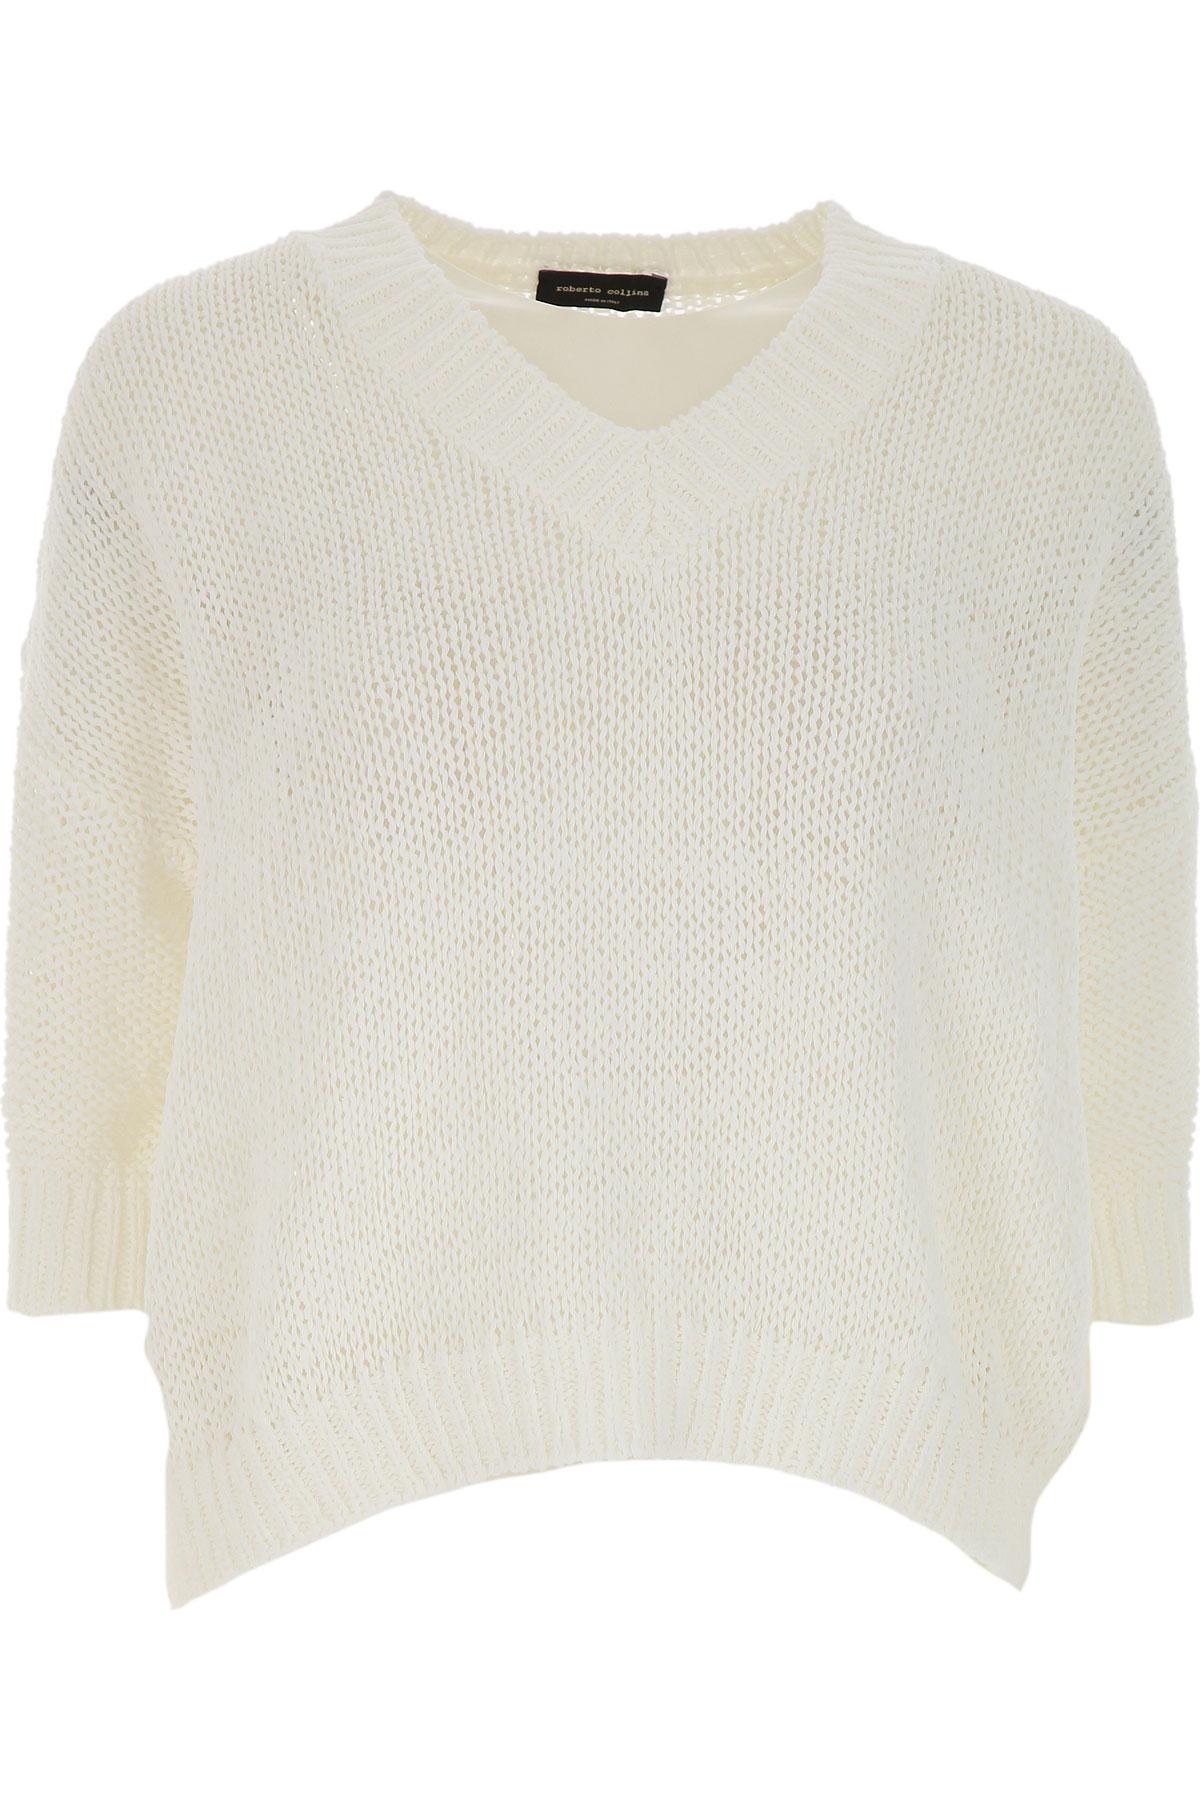 Roberto Collina Sweater for Women Jumper On Sale, White, Cotton, 2019, 4 M